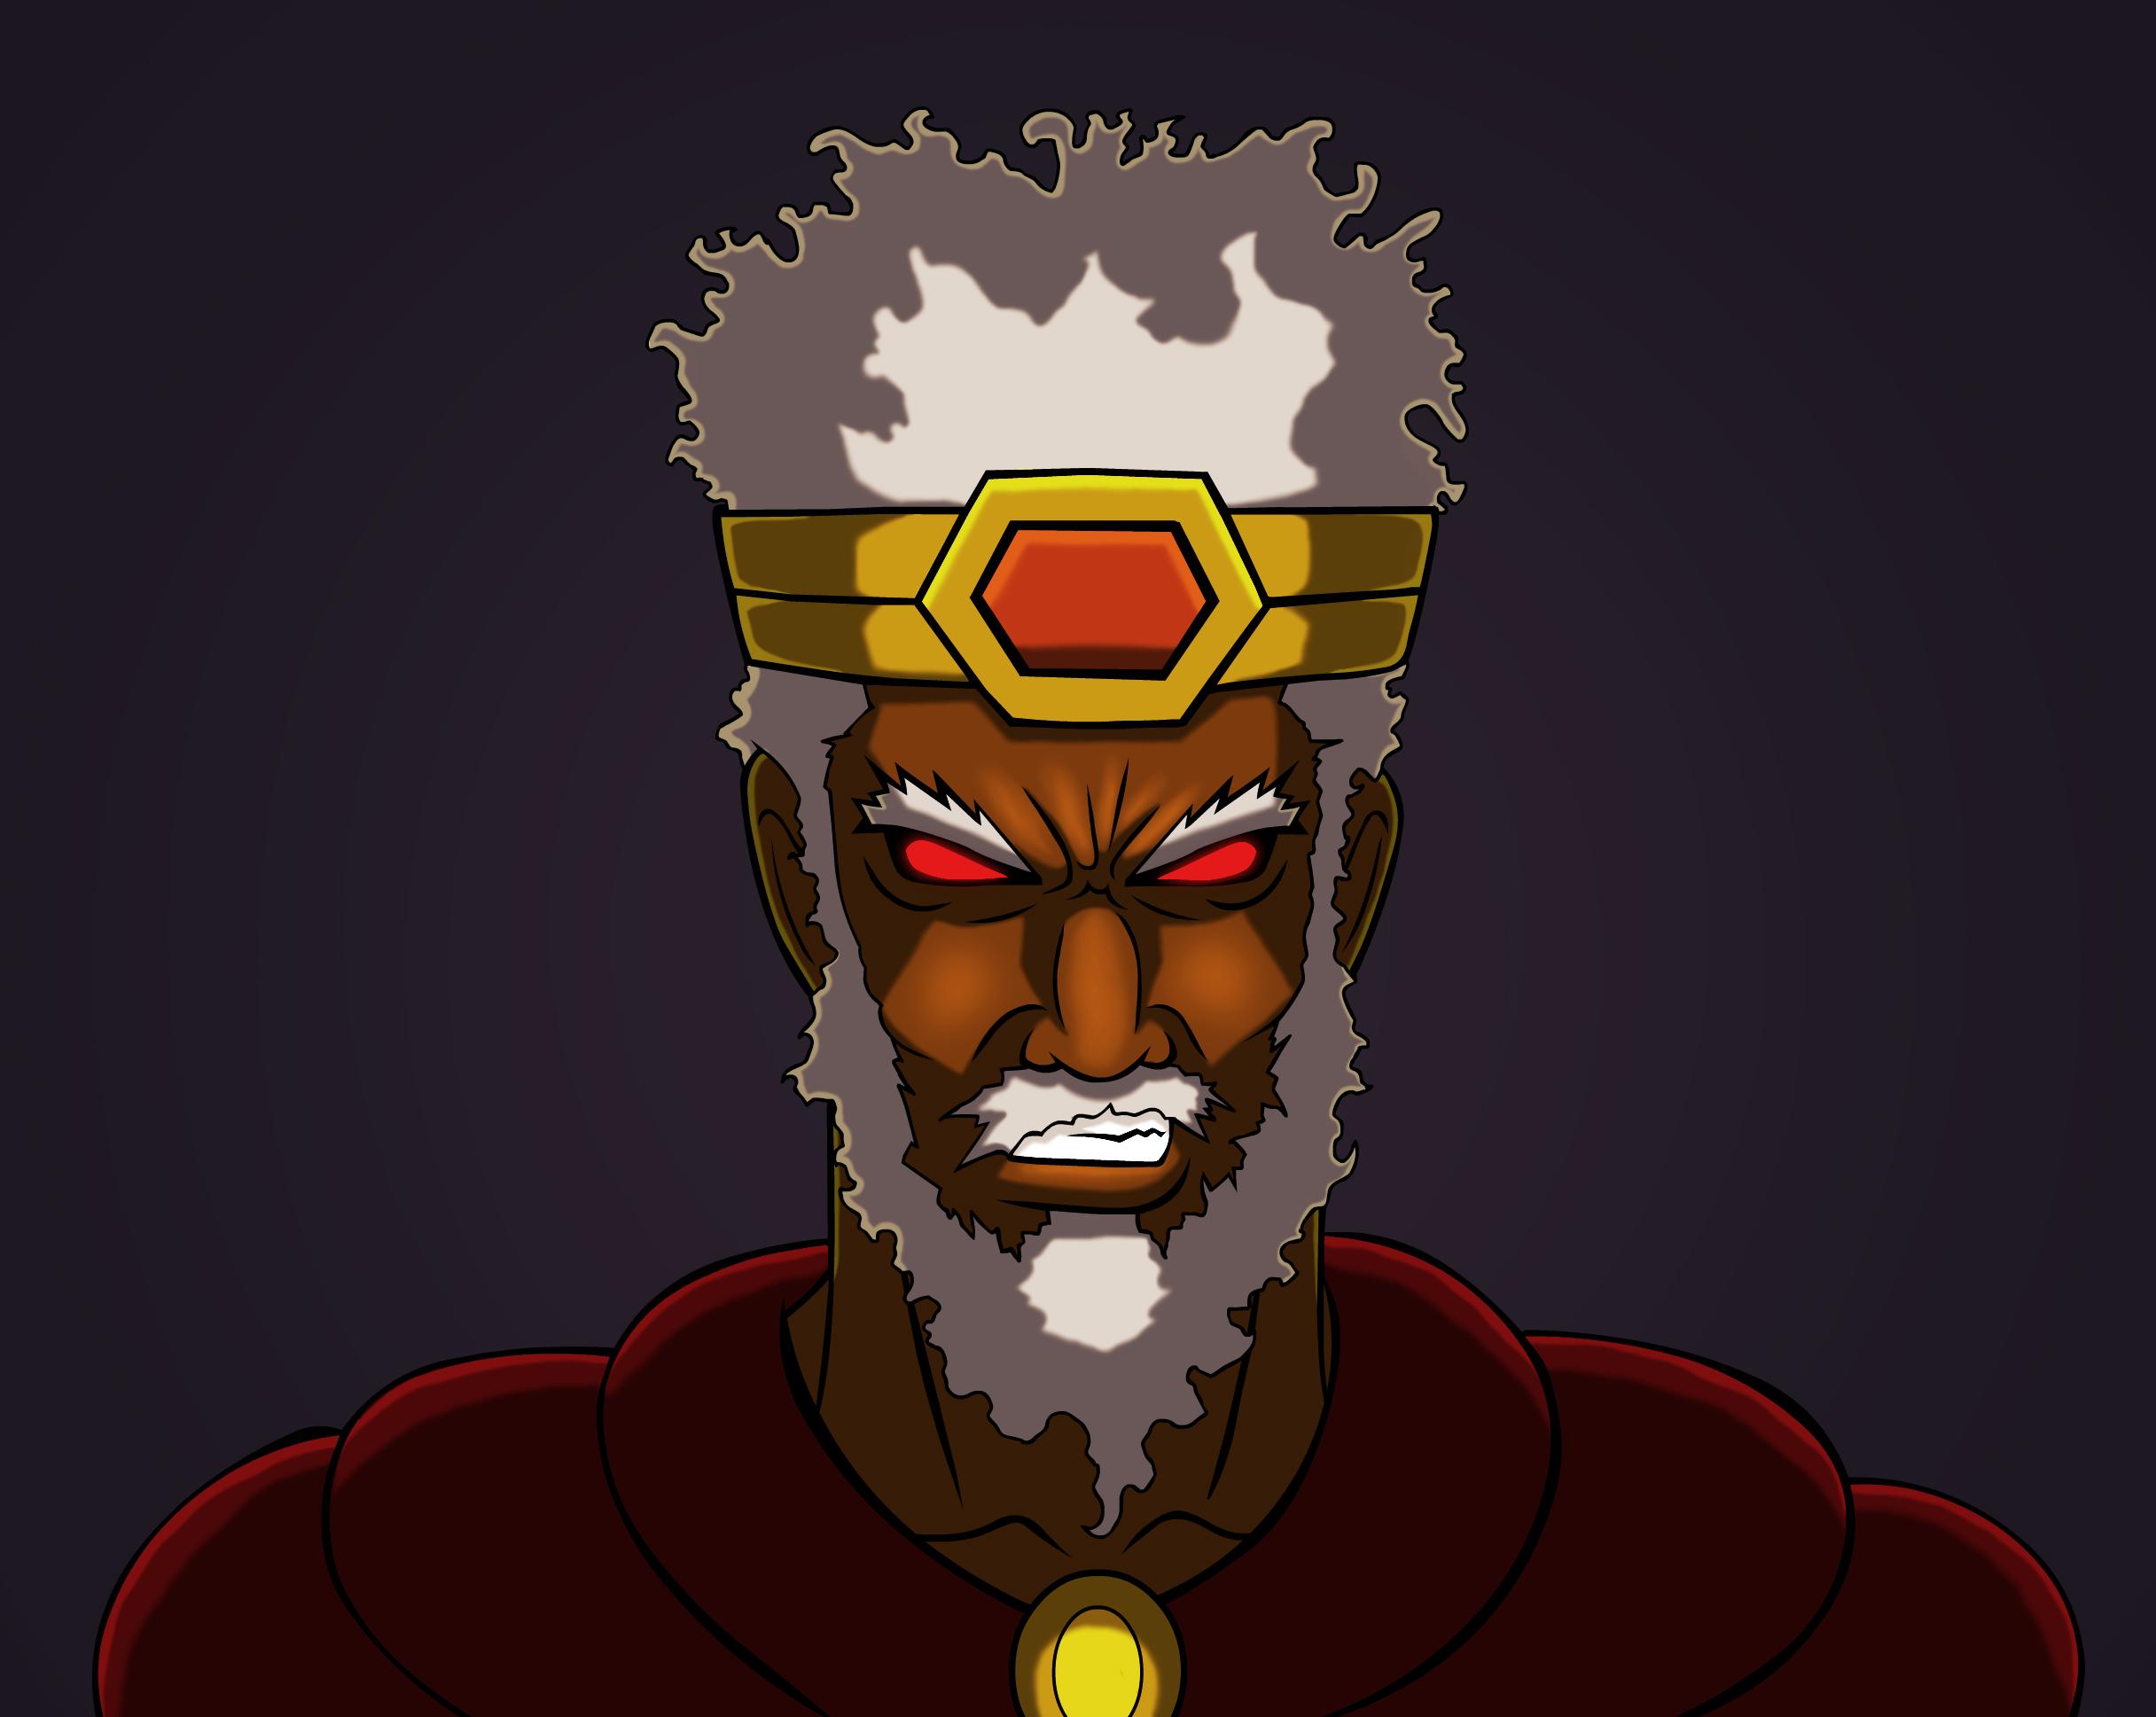 King Bayaa